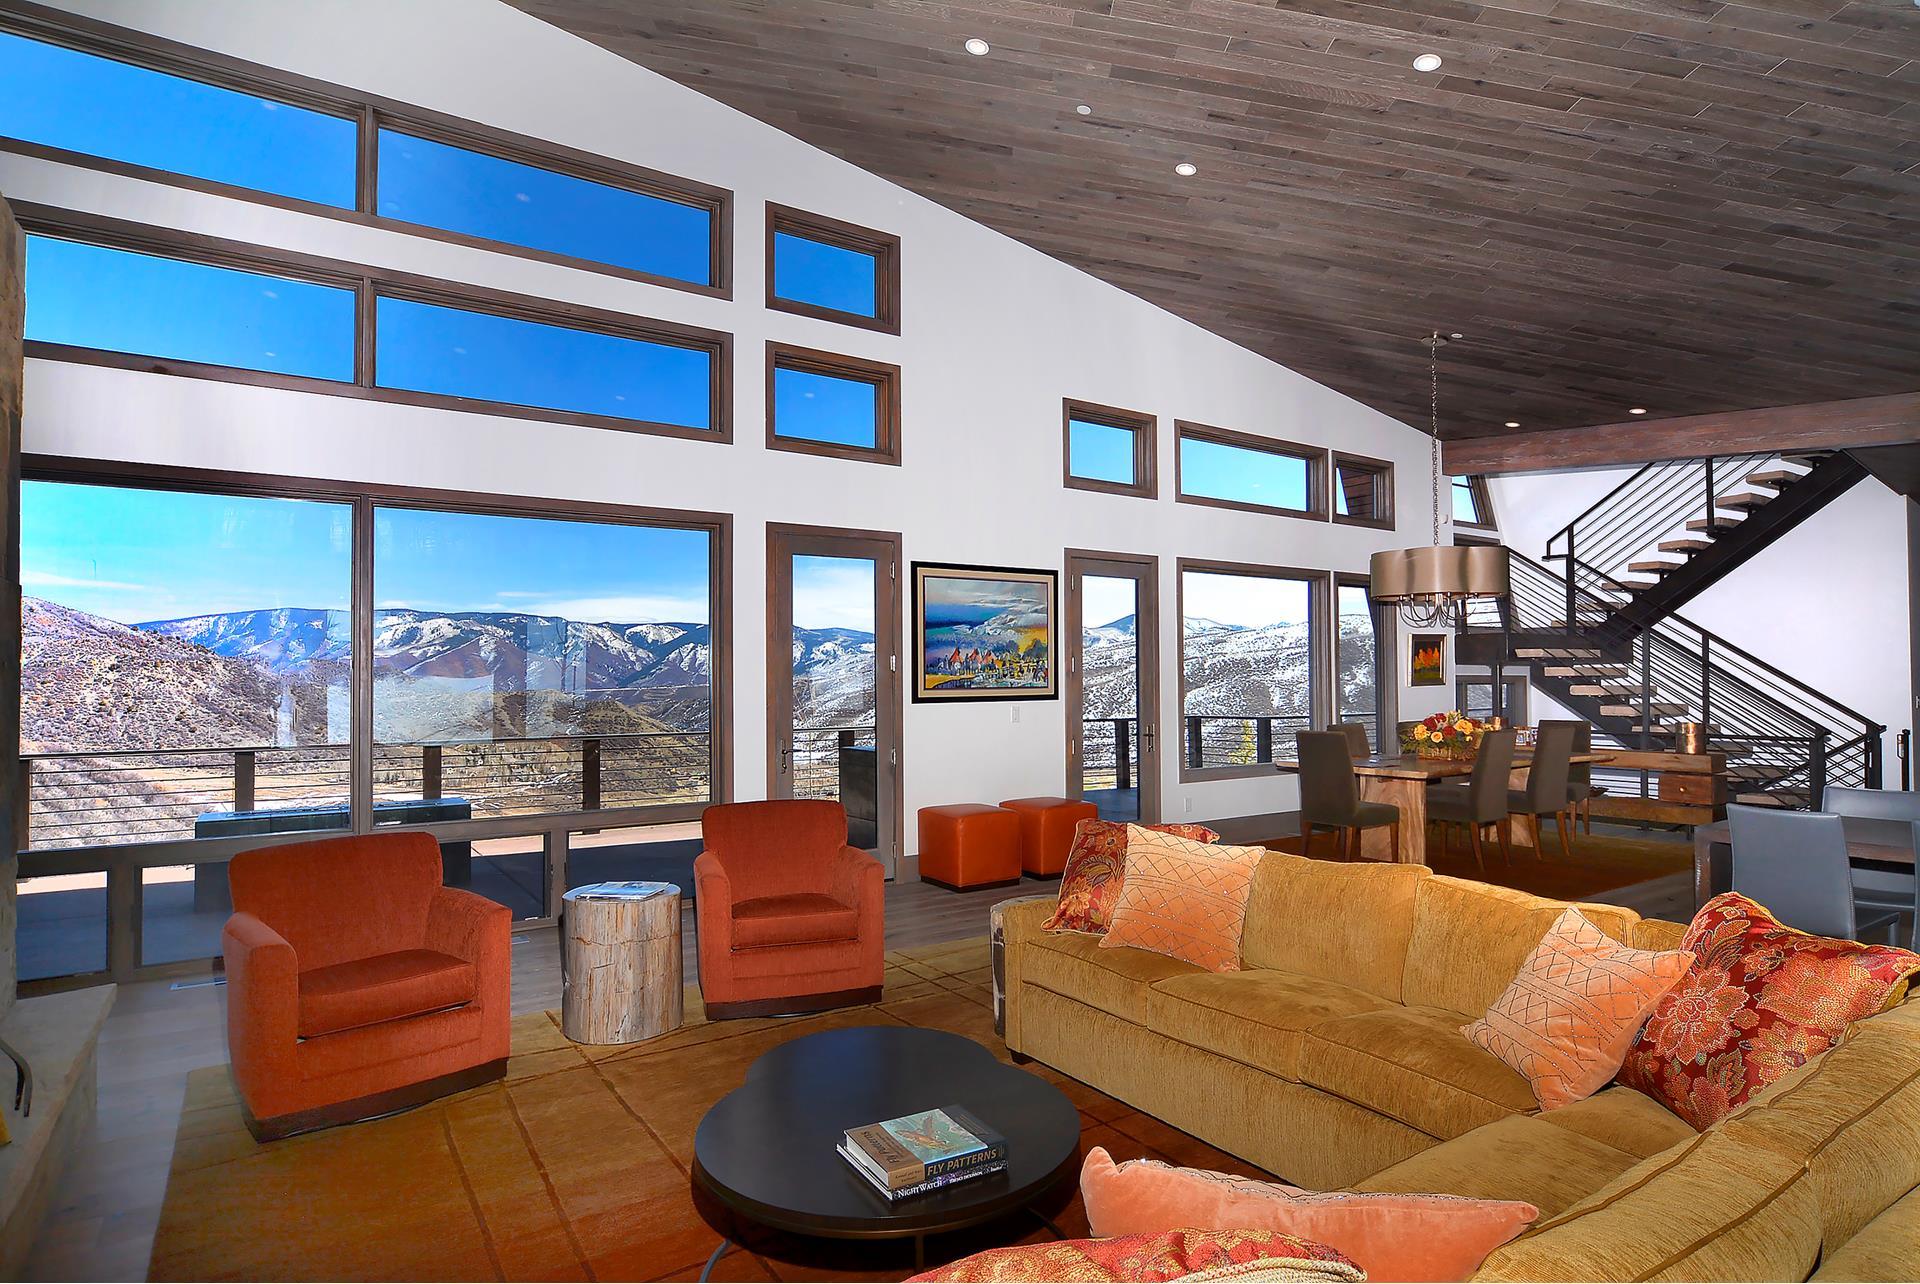 272 Oak Ridge Road - Snowmass Village, Colorado